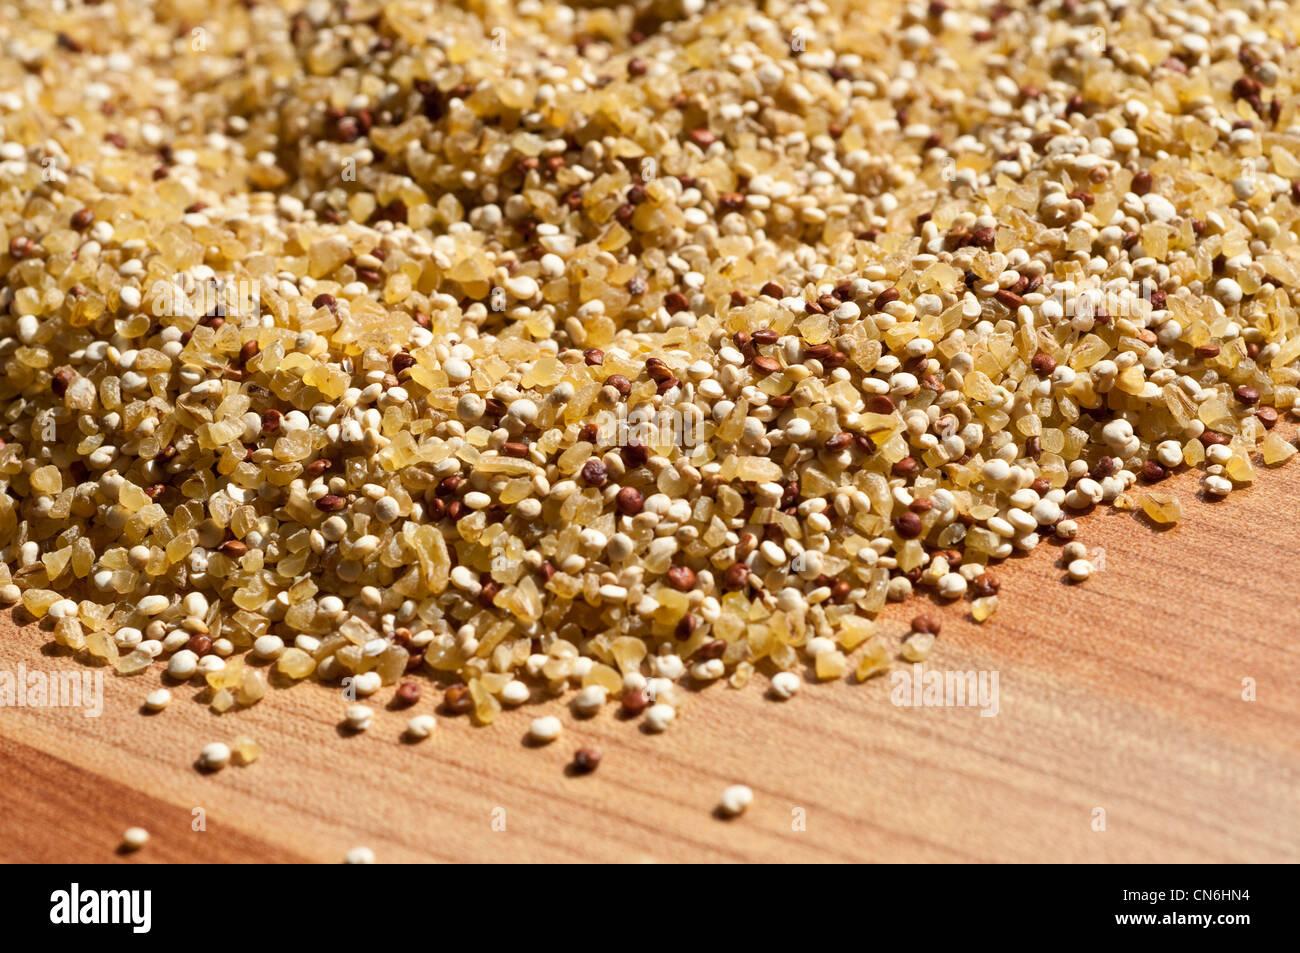 Red and white quinoa - Stock Image